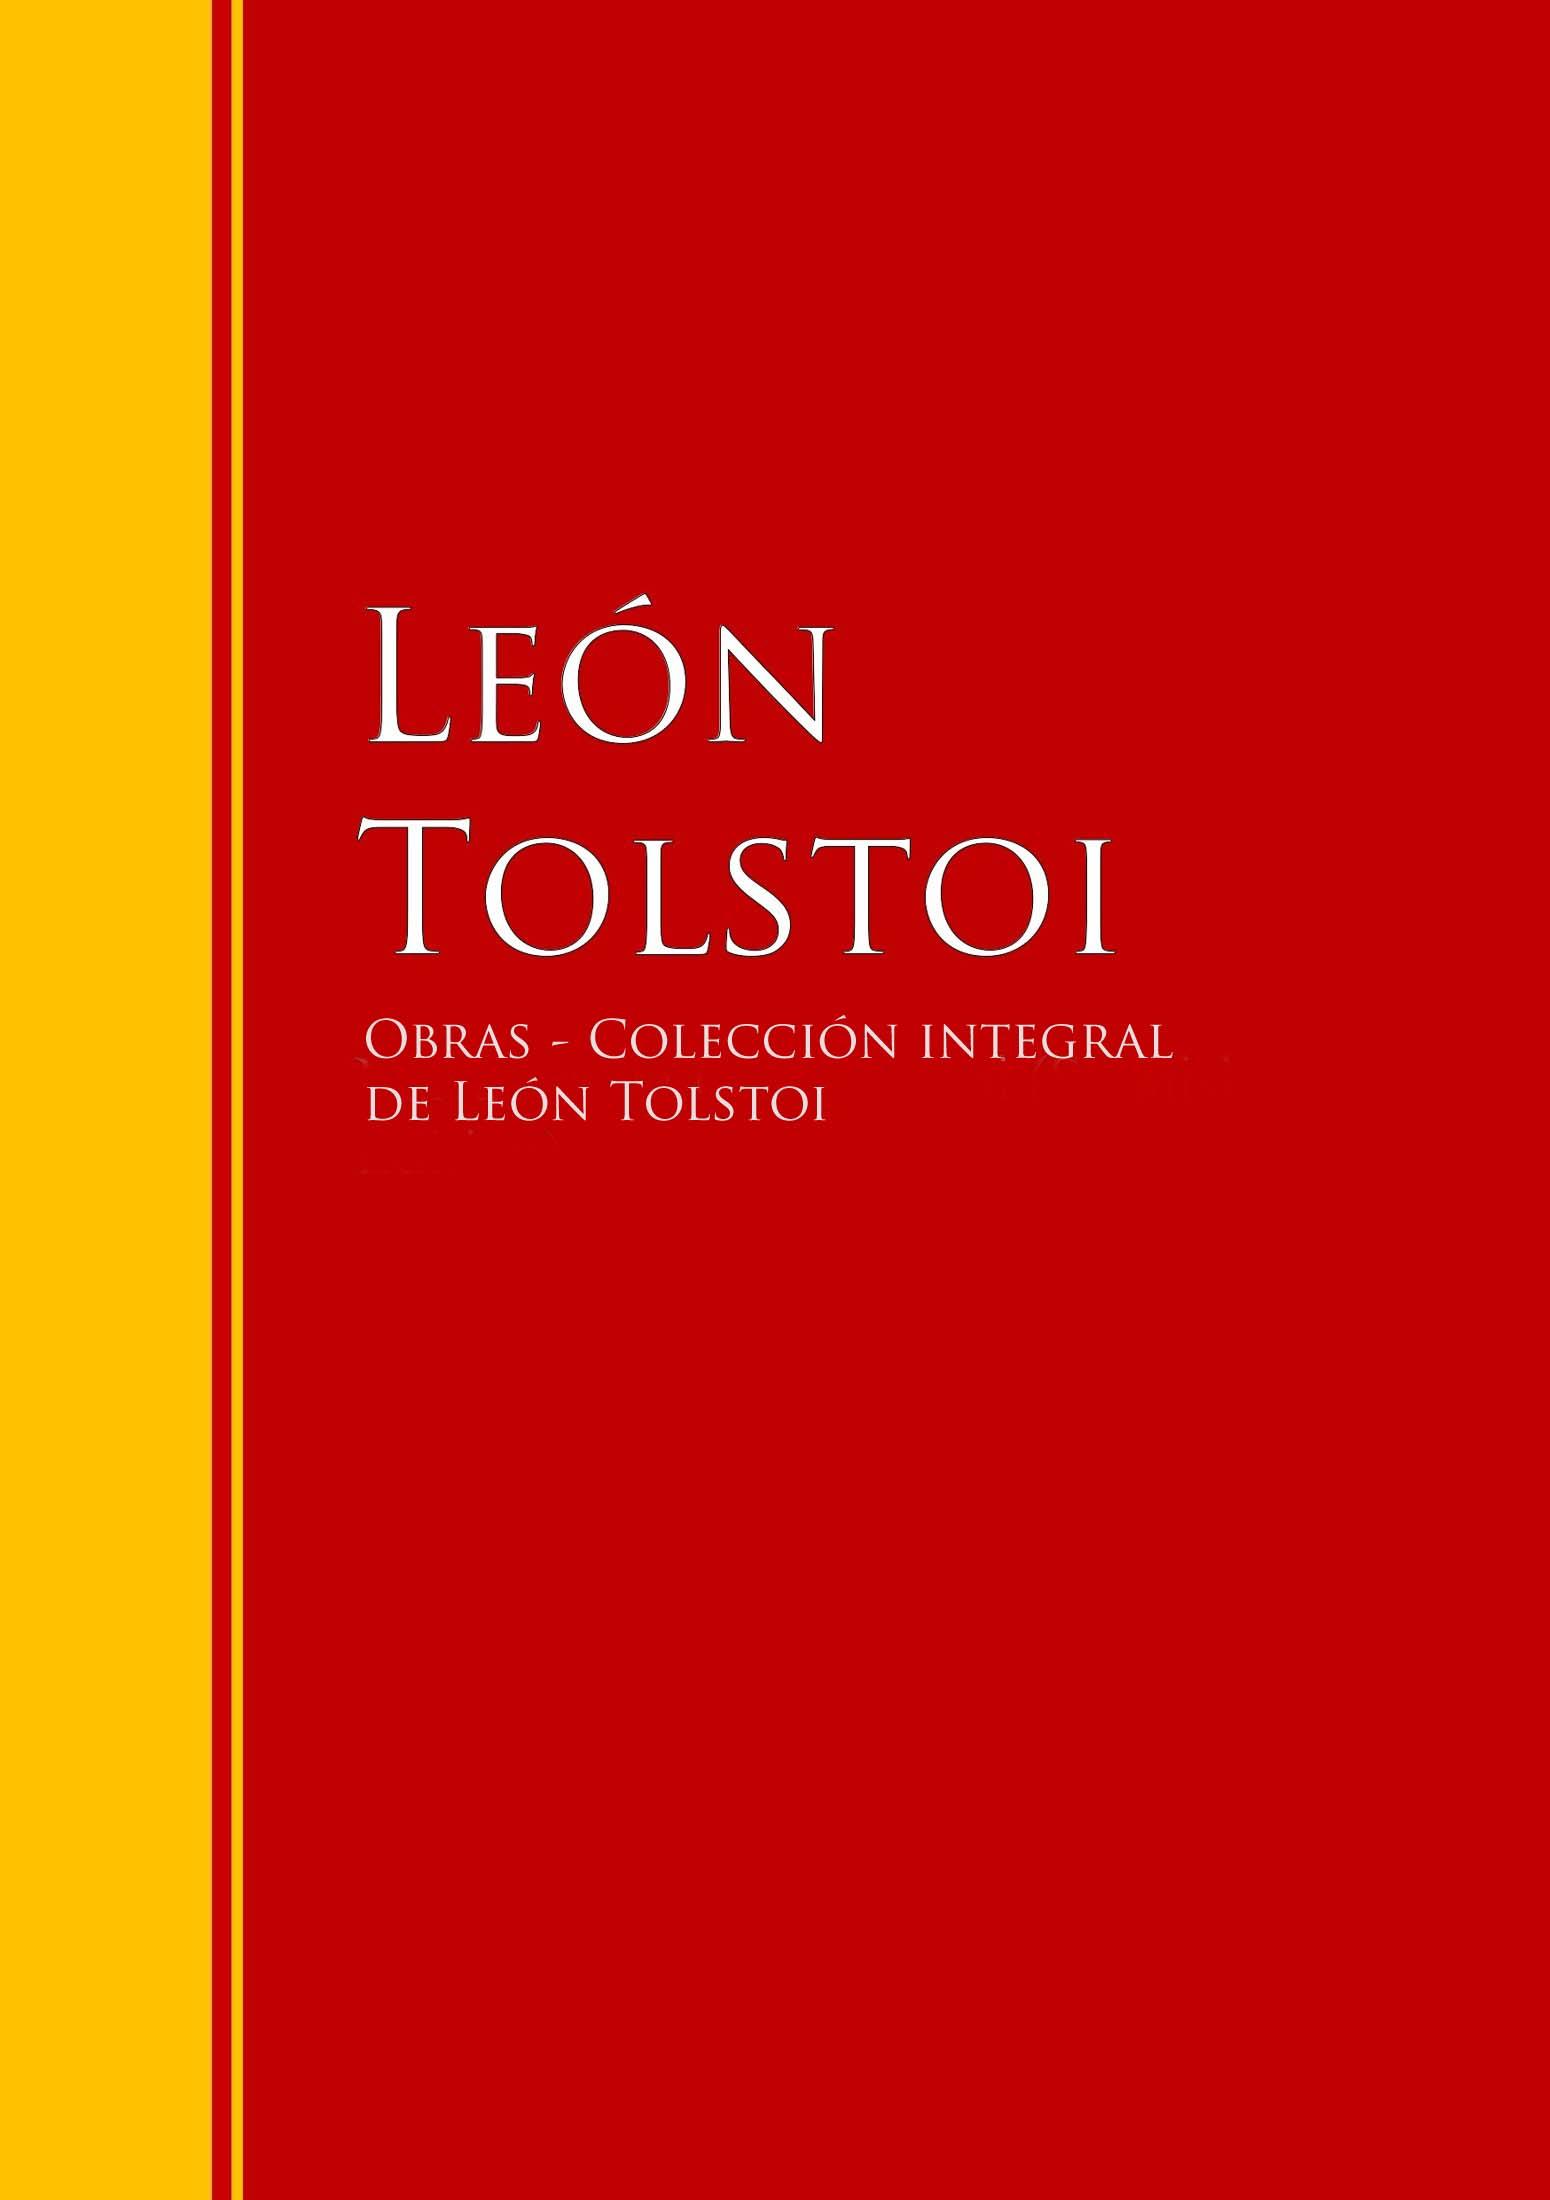 Leon Tolstoi Obras de León Tolstoi - Colección лев толстой tolstoi for the young select tales from tolstoi